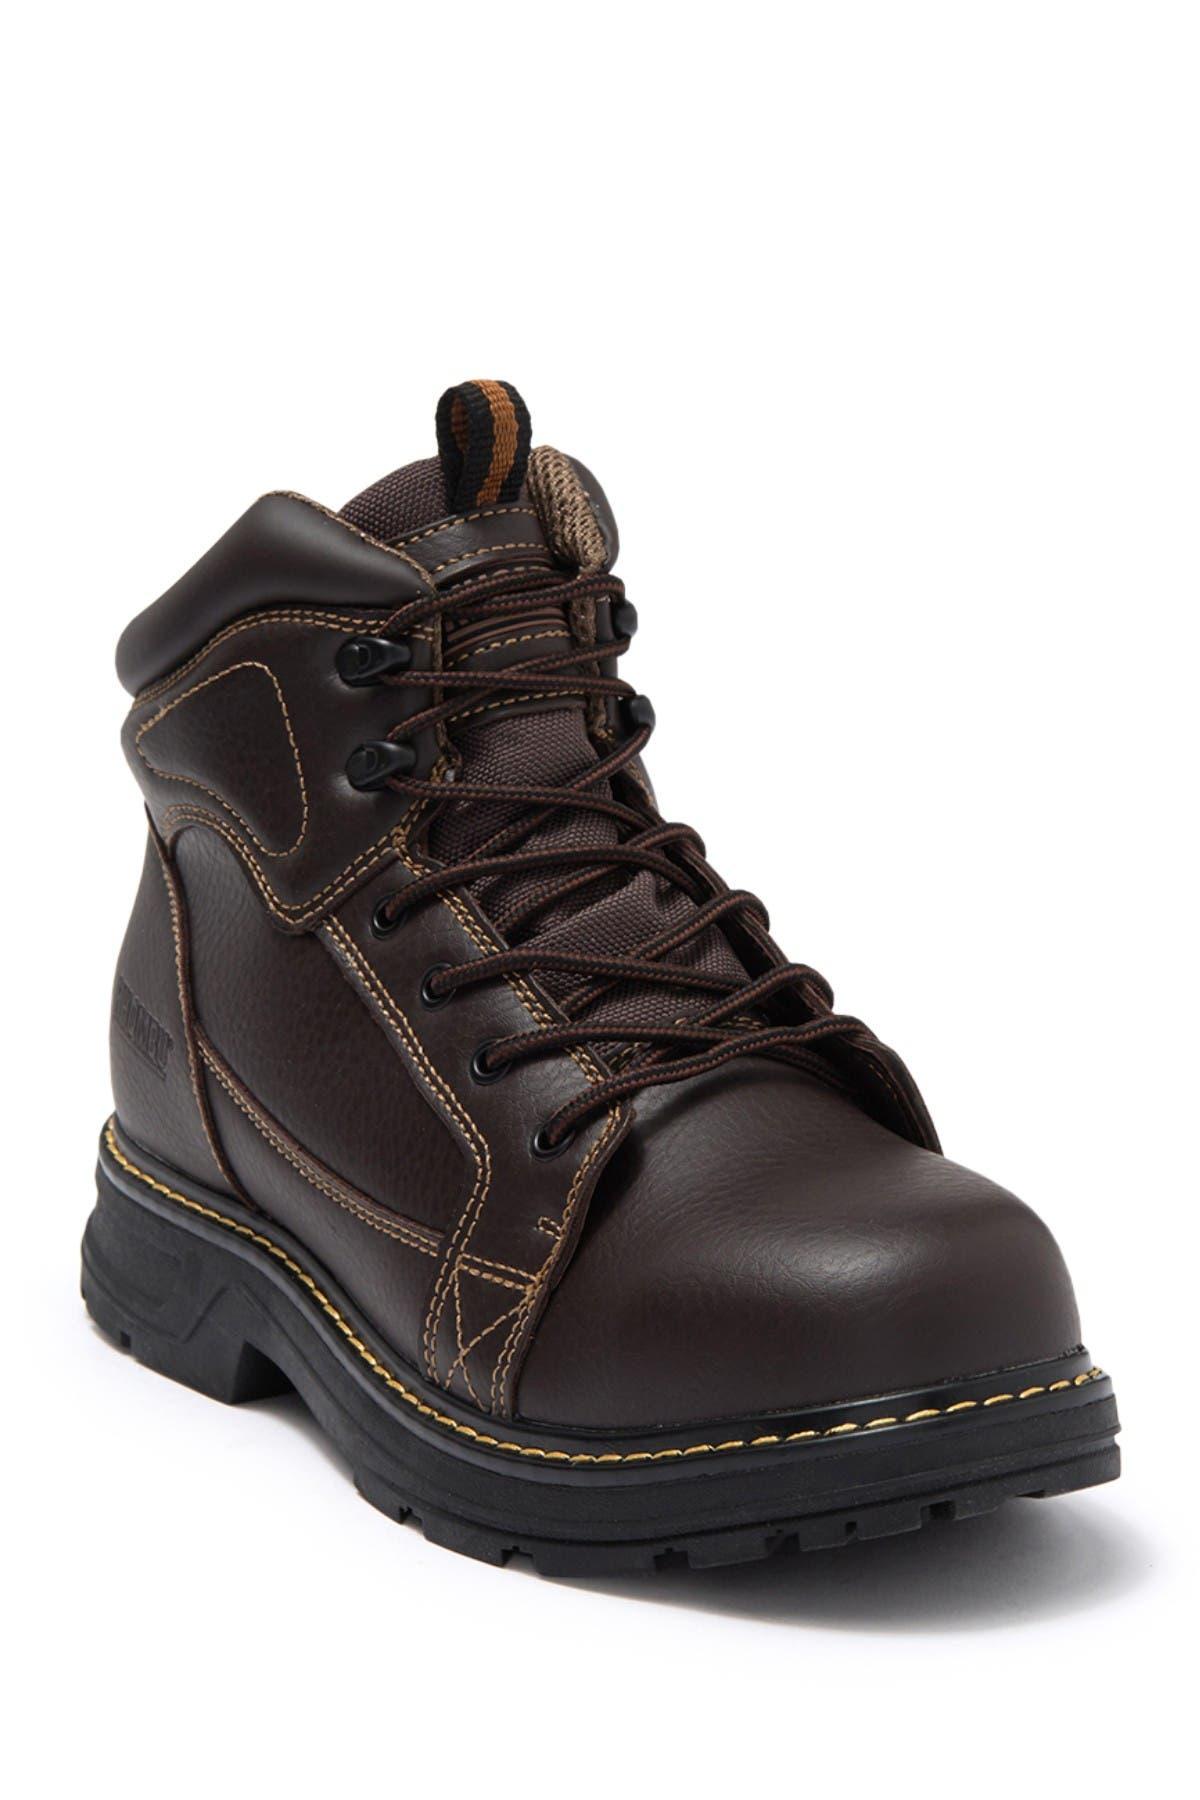 Image of Khombu Paver Boot